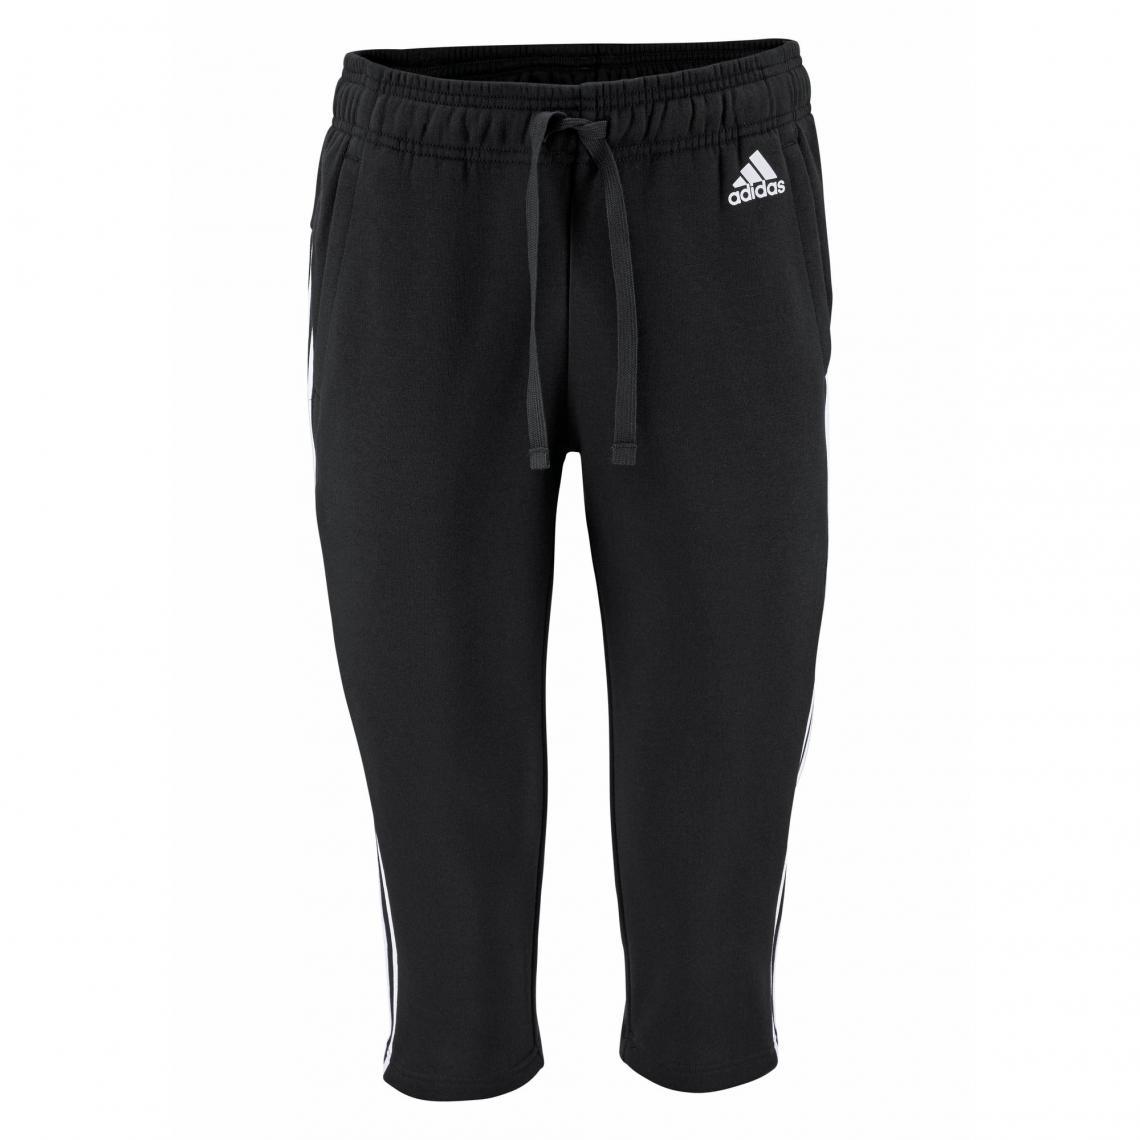 dc964a3aaac52 Jogging adidas Performance Essential 3S 3 4 pant femme - Noir - Blanc Adidas  Performance